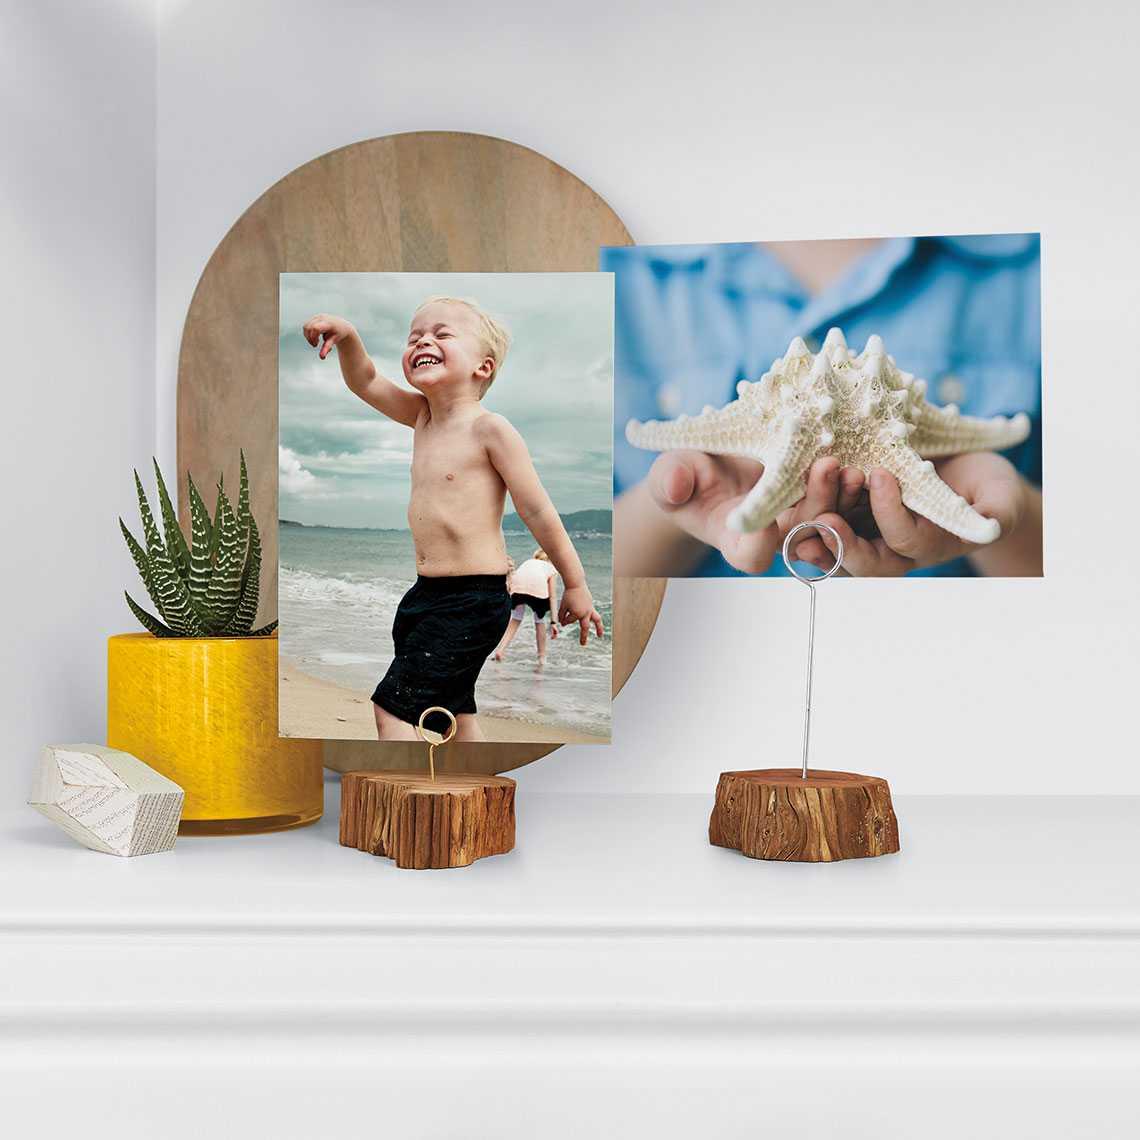 4x6 Glossy Print environment image